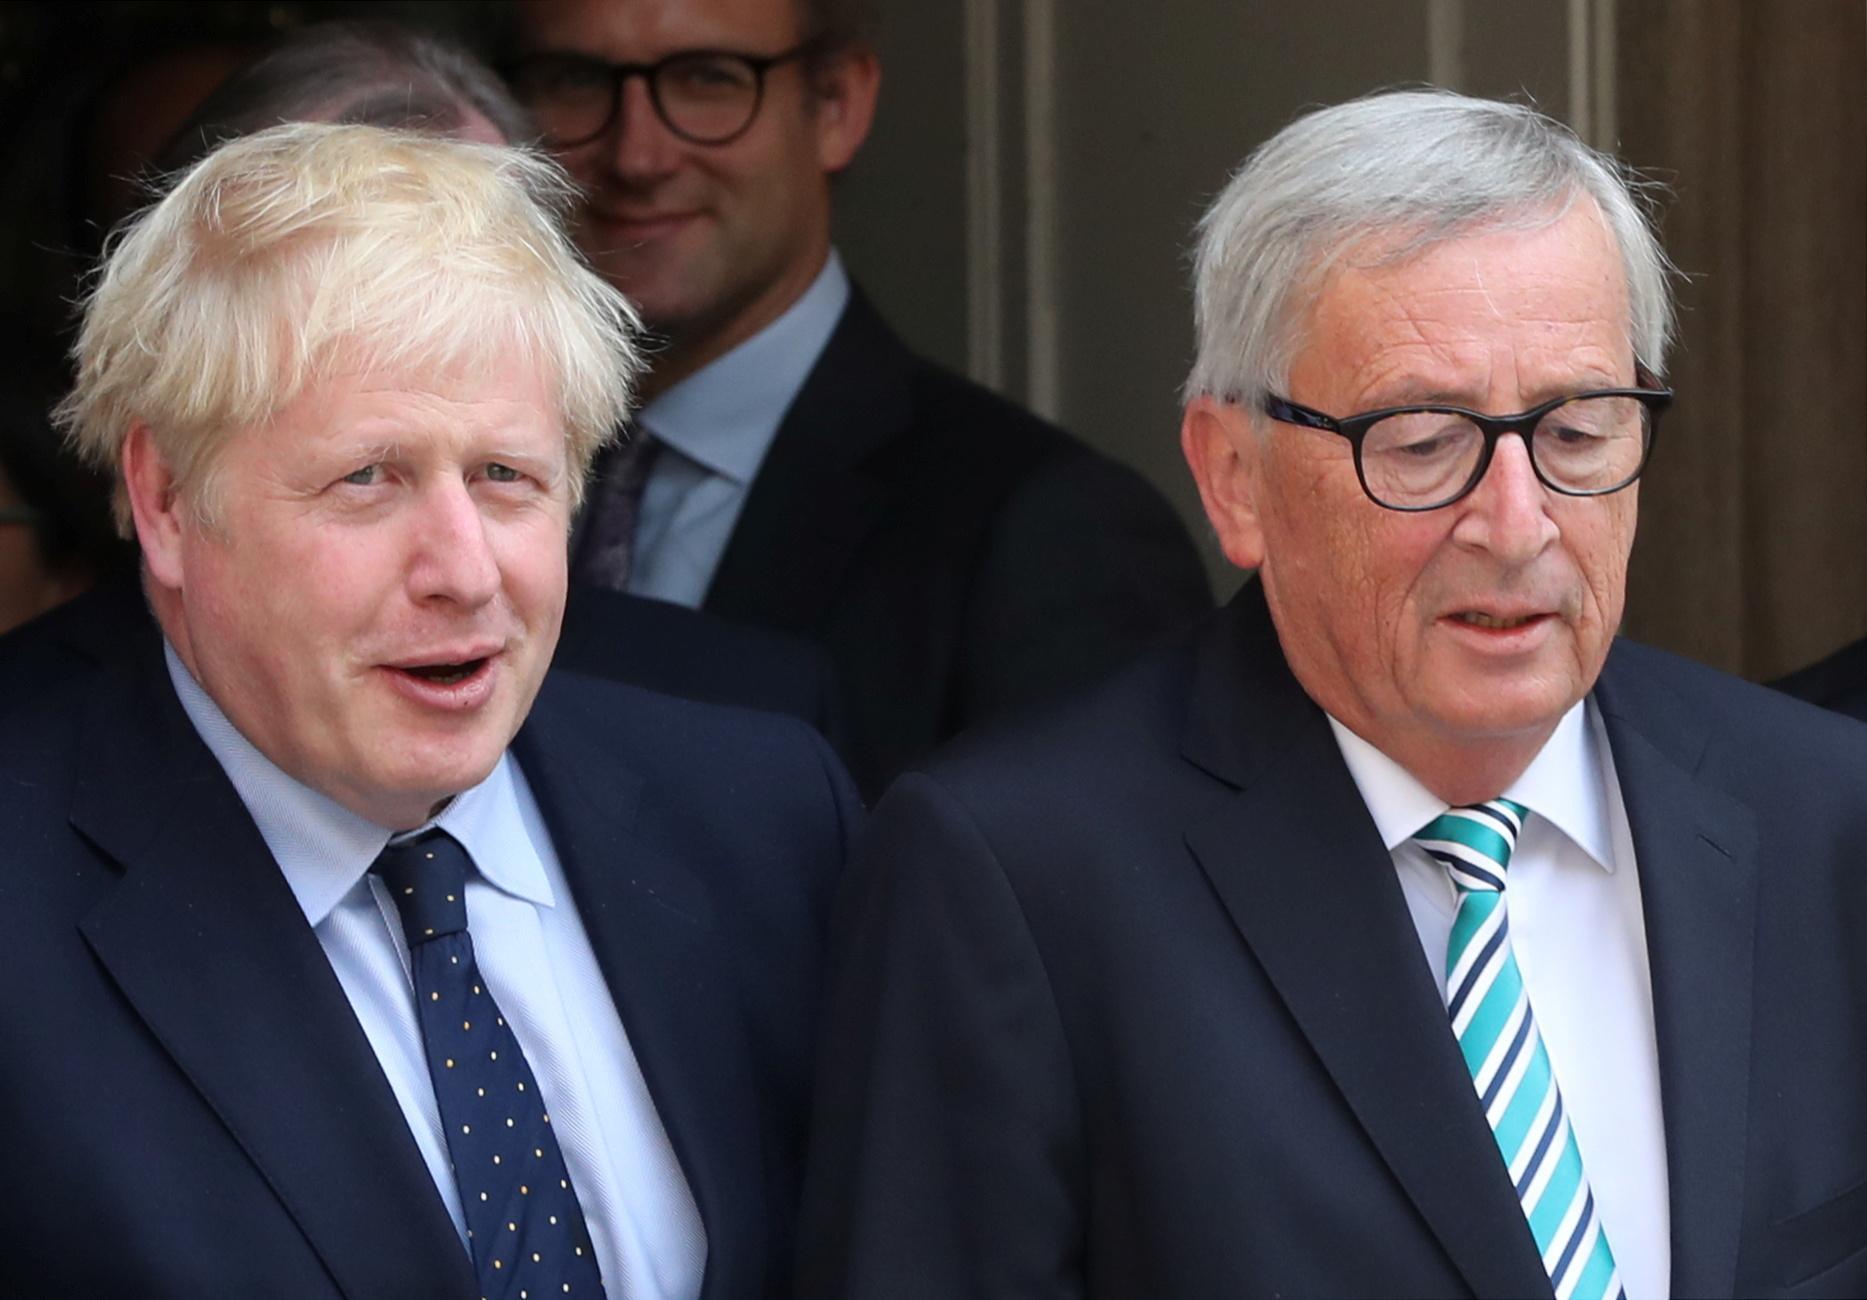 EU's Juncker, Johnson have spoken on Brexit - EU Commission